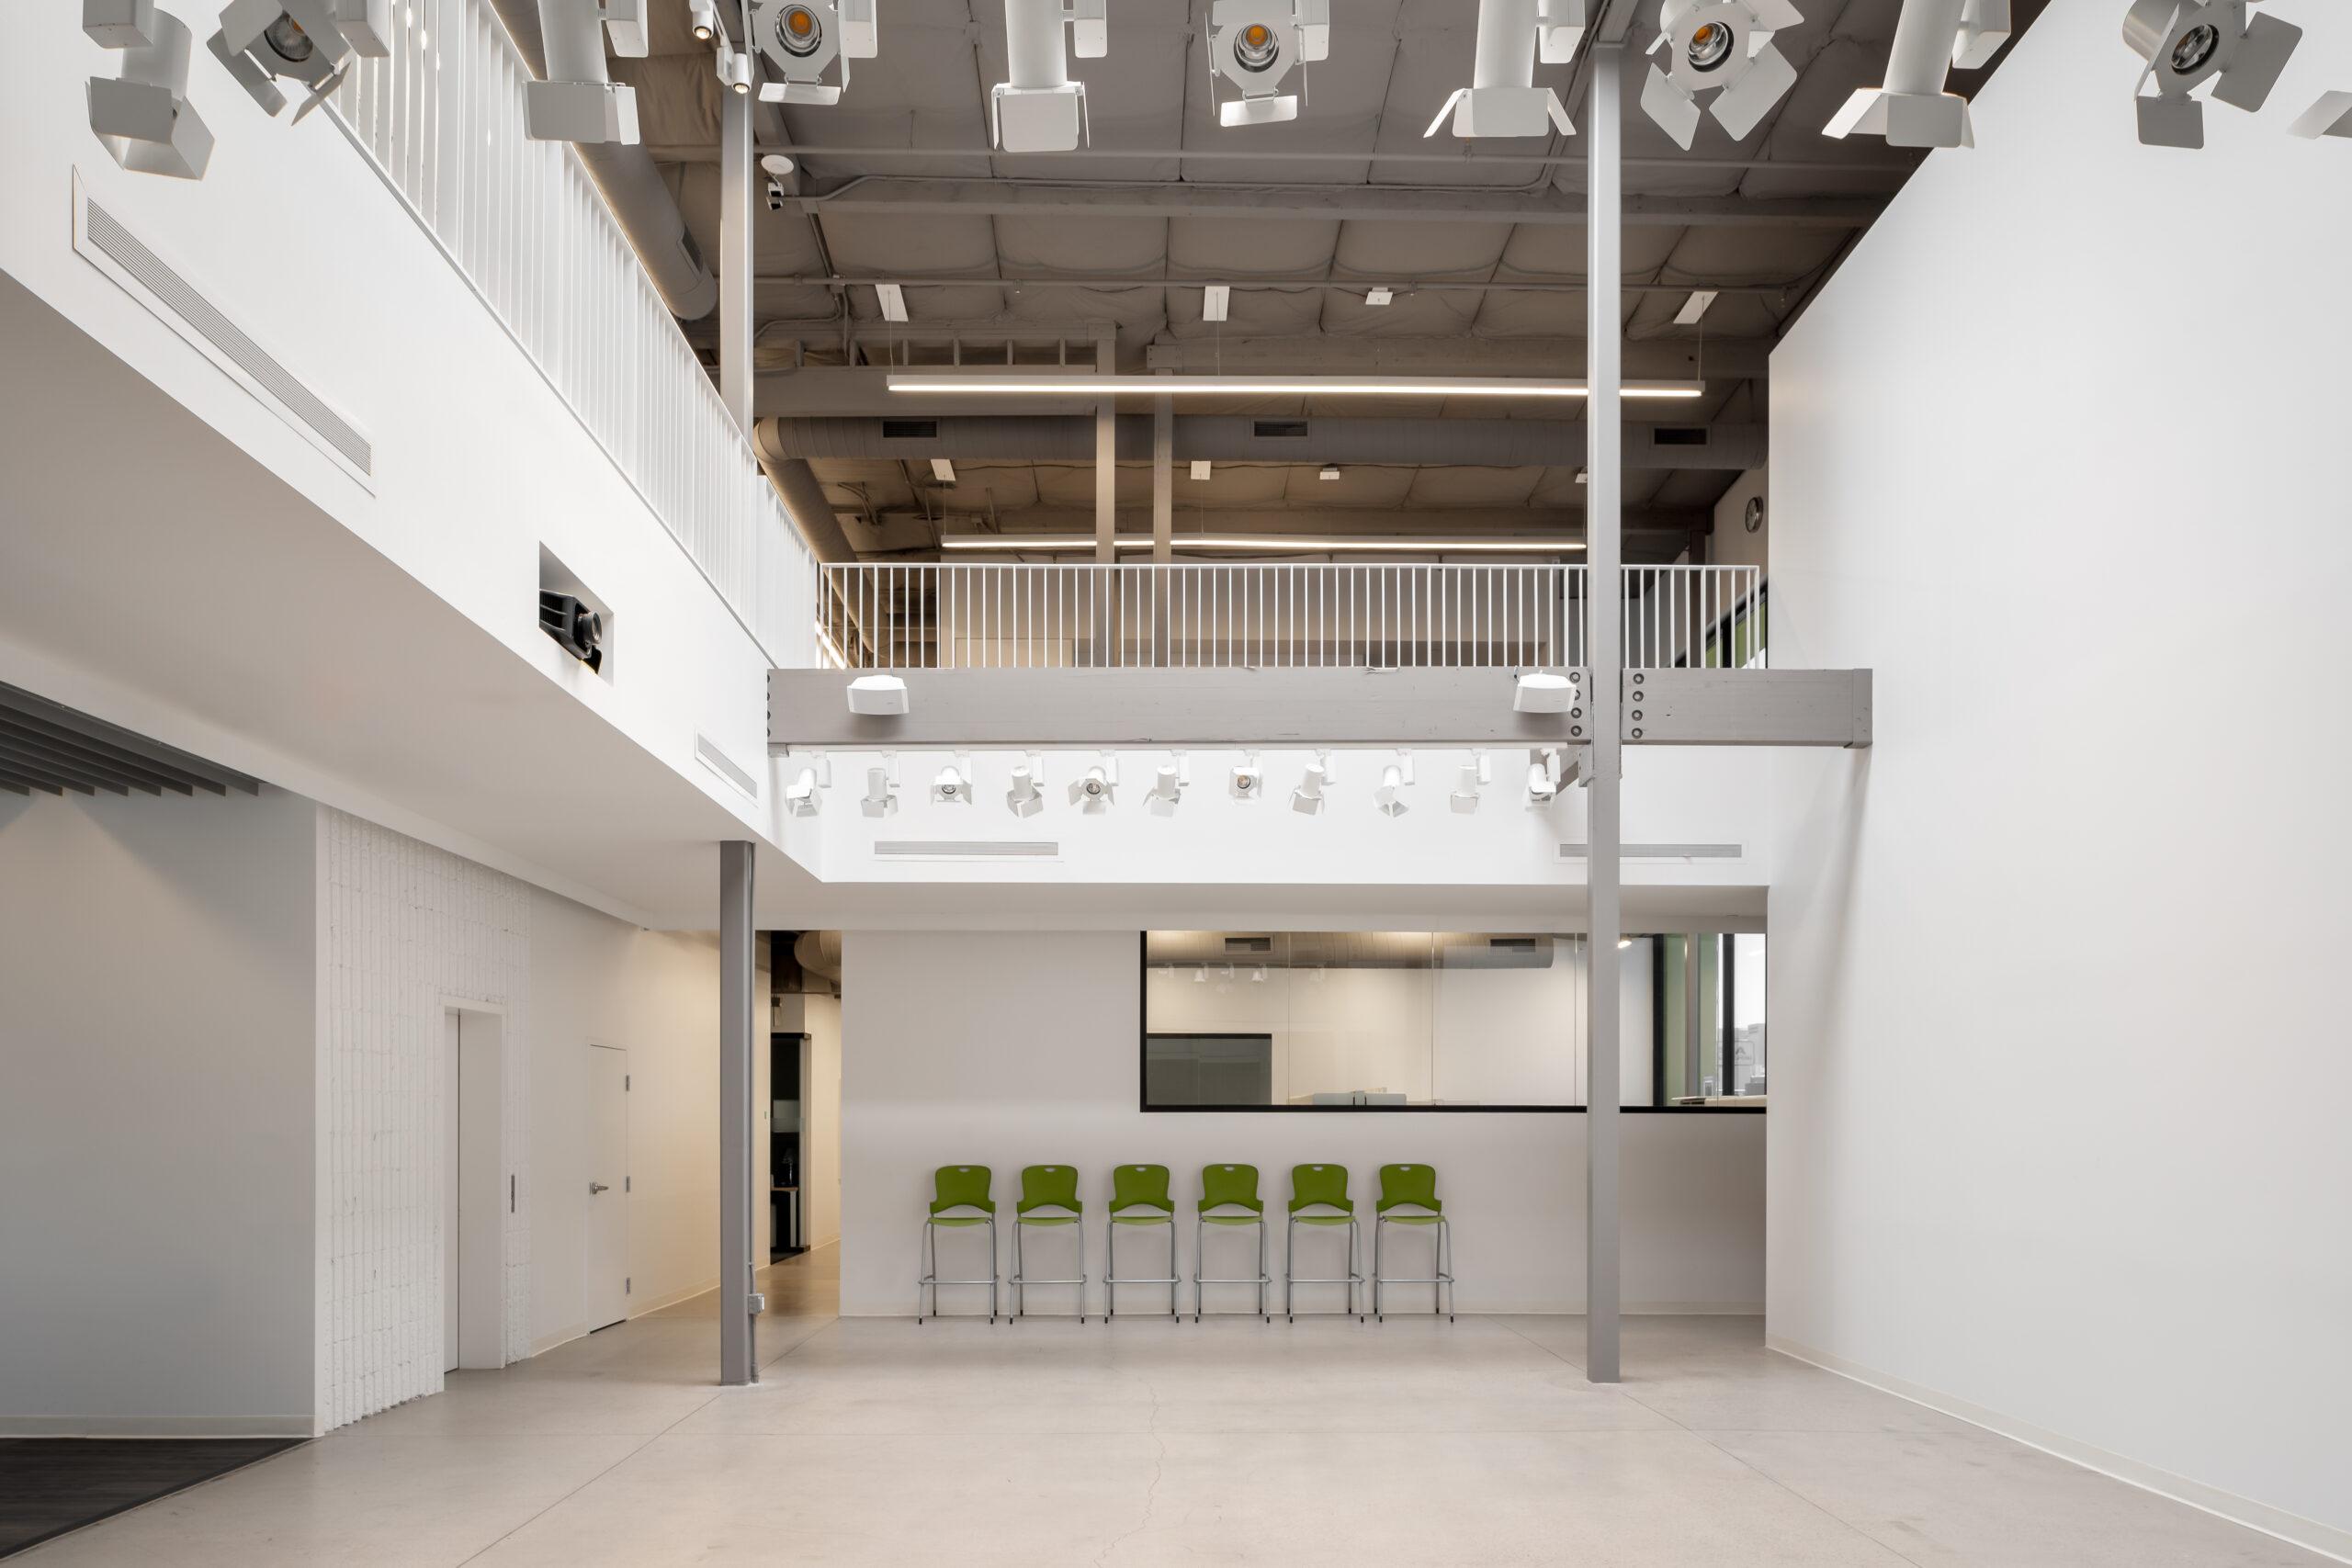 Free Arts interior (6of11)